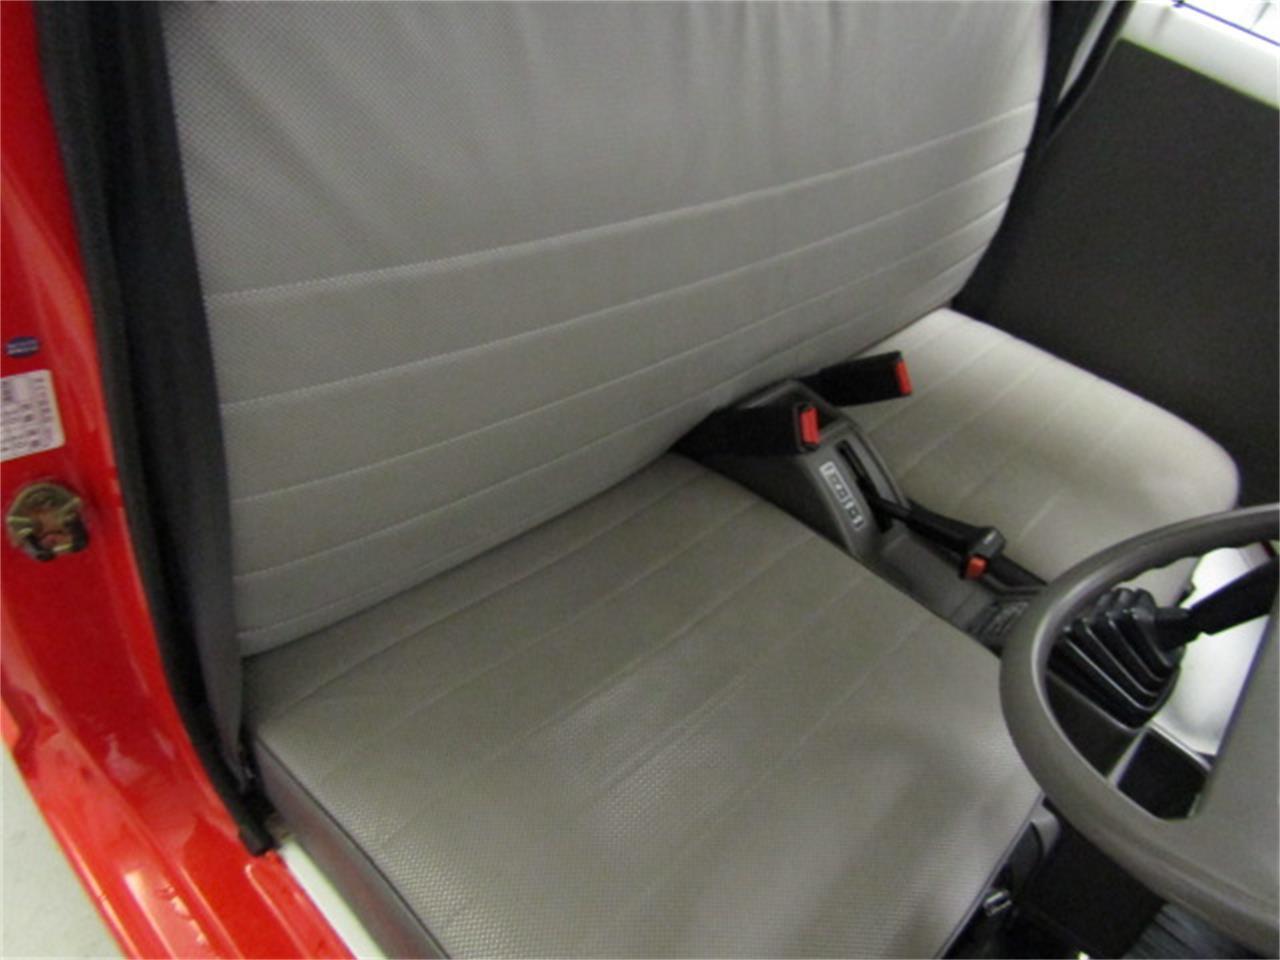 Large Picture of '91 Suzuki Carry located in Christiansburg Virginia - KIFI